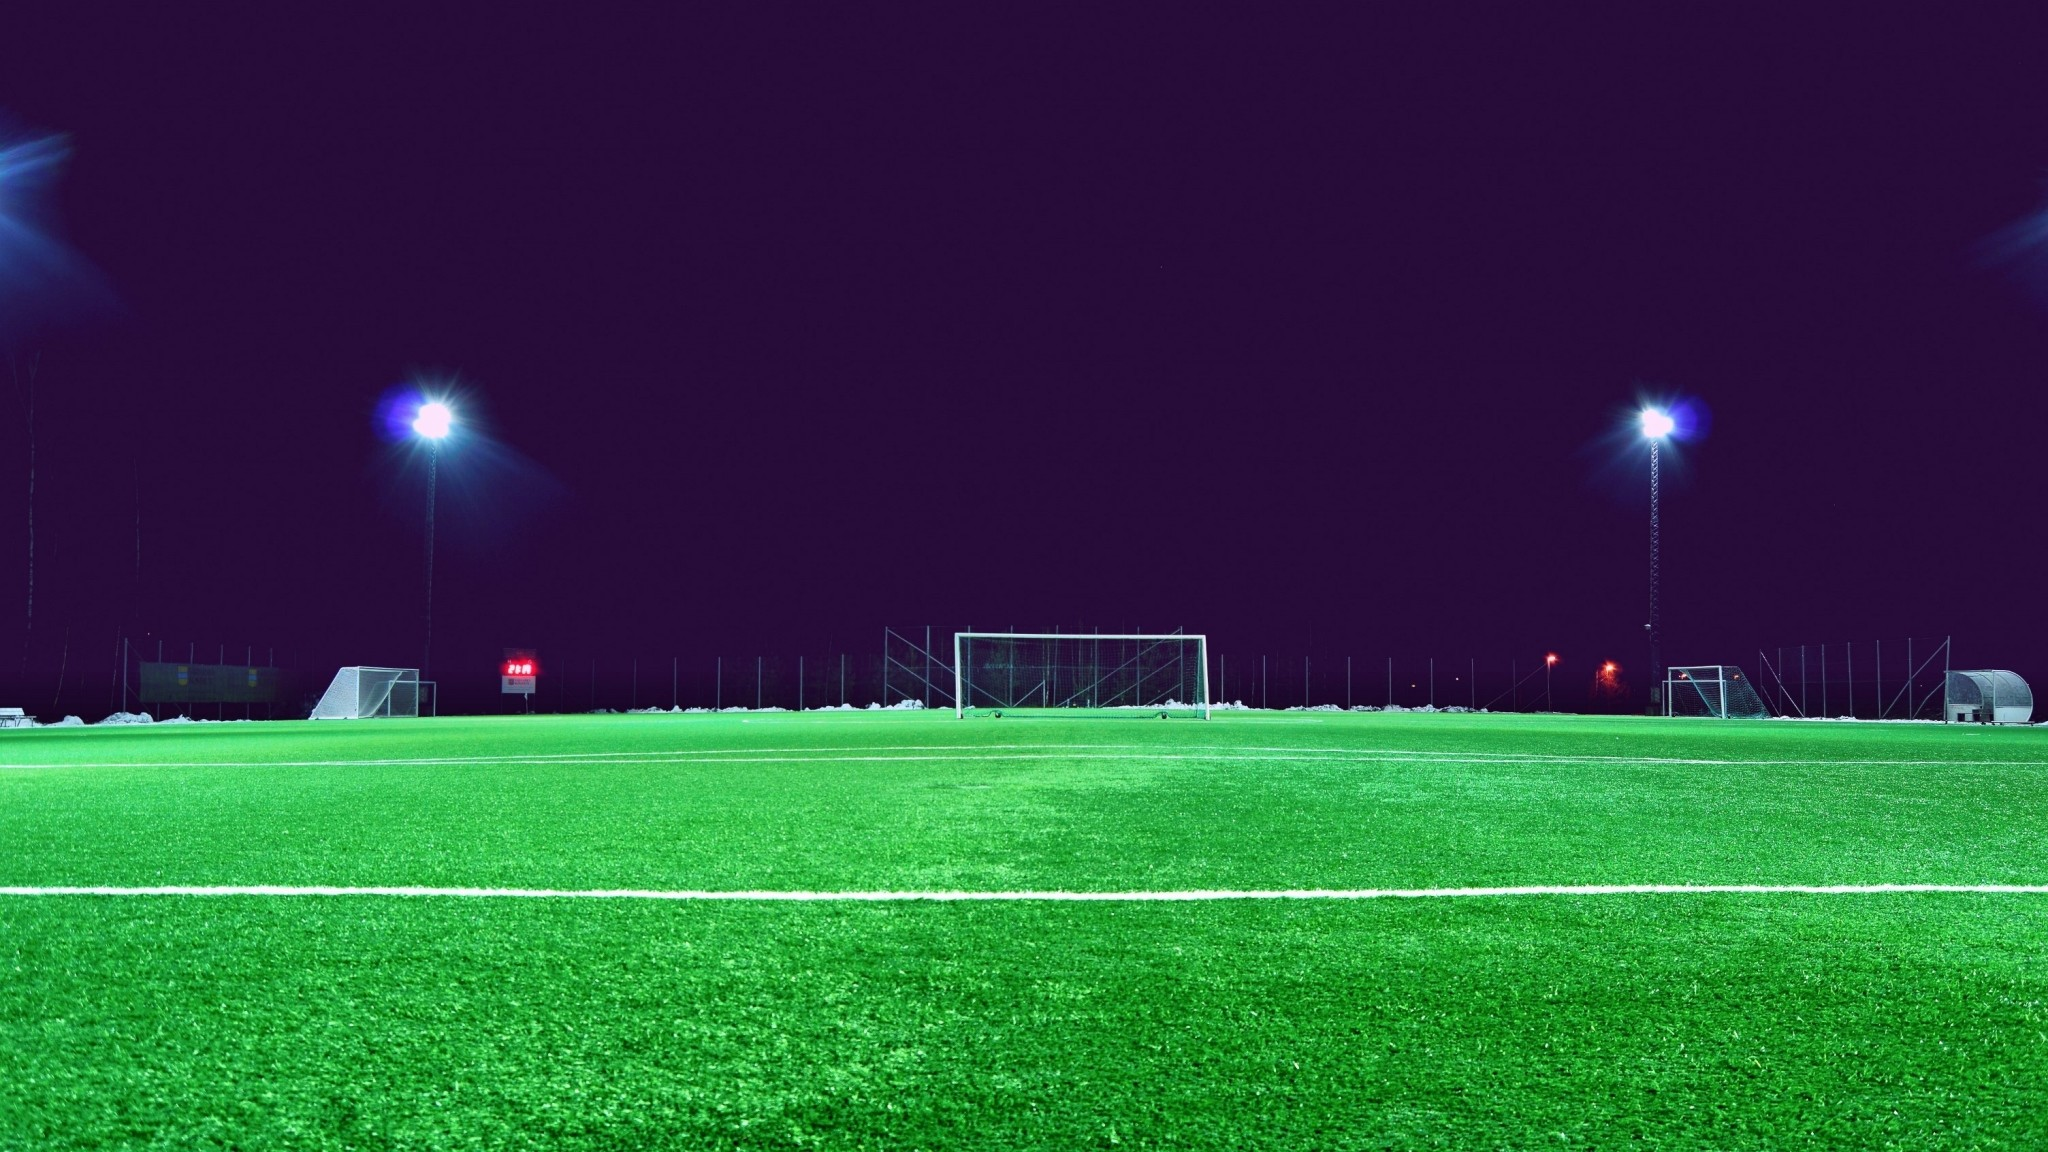 Wallpaper football field, lawn, gate